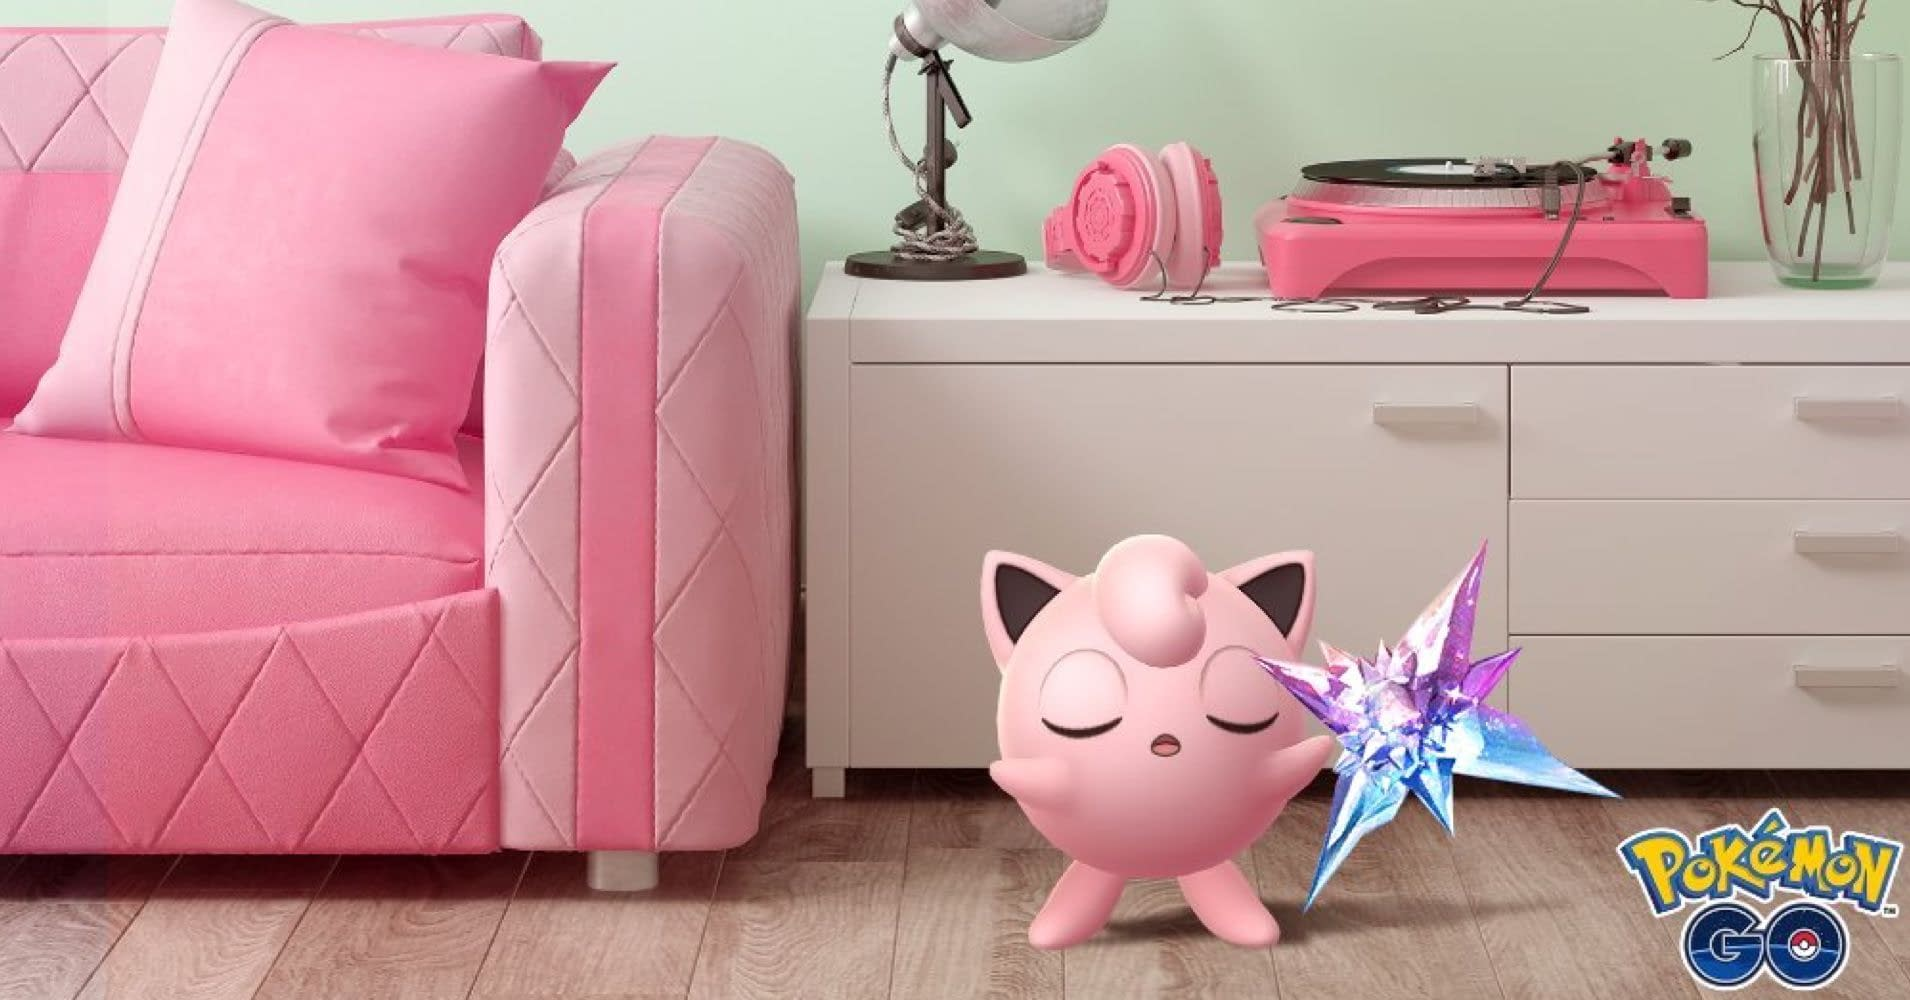 How To Farm Stardust Successfully In Pokémon Go